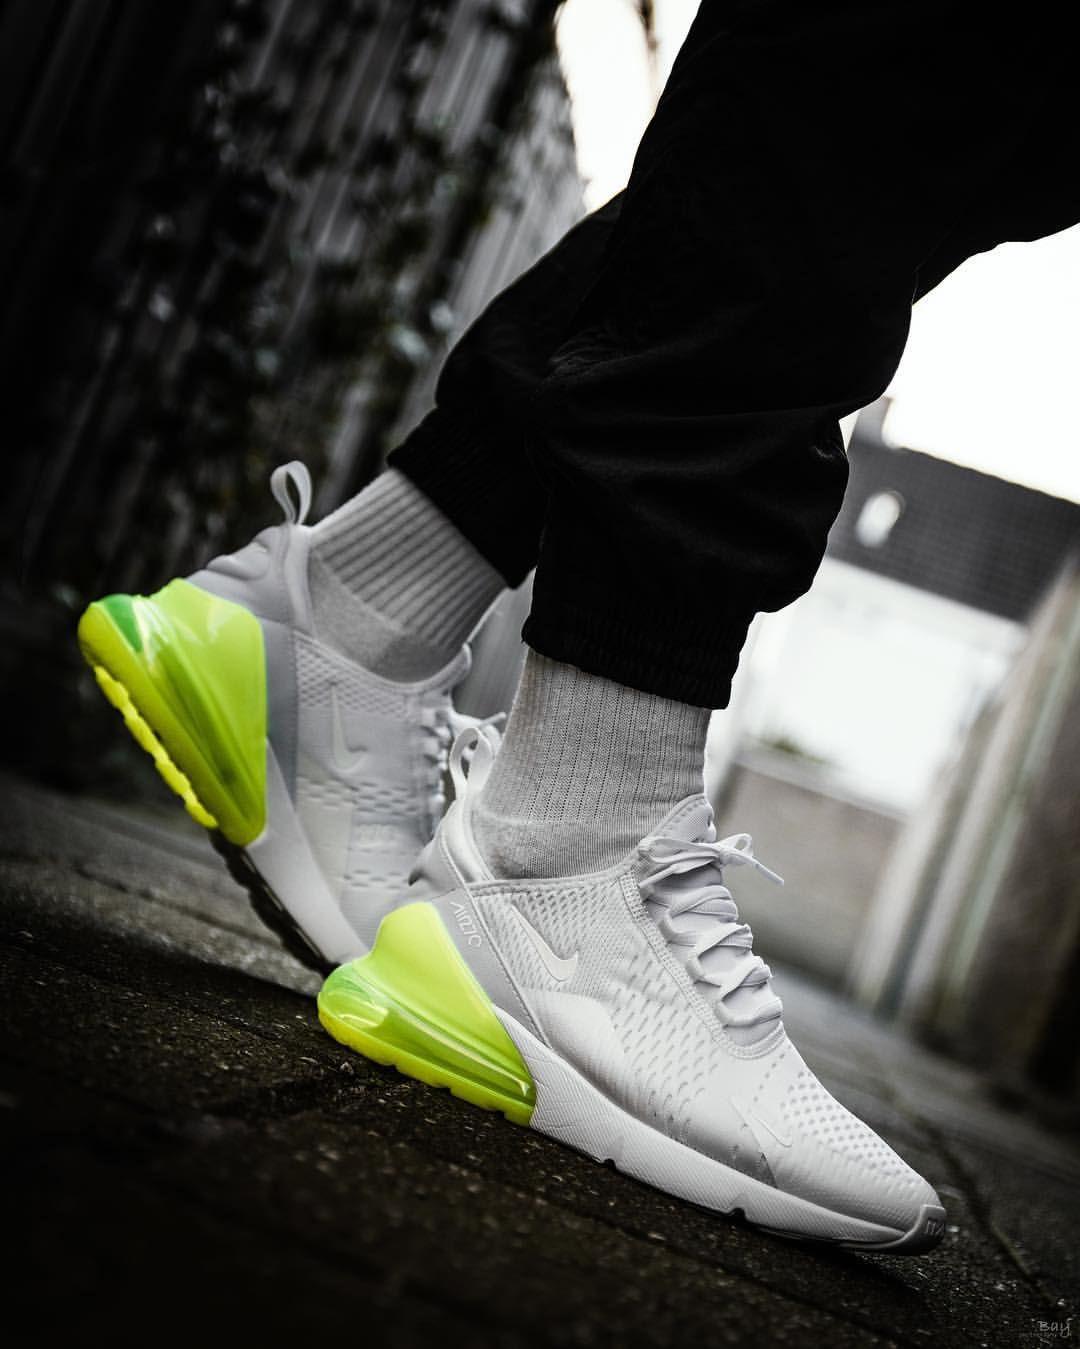 Nike Air Max 270  bianca Volt    Footwear   Volt Pinterest   Nike air max   29bec2